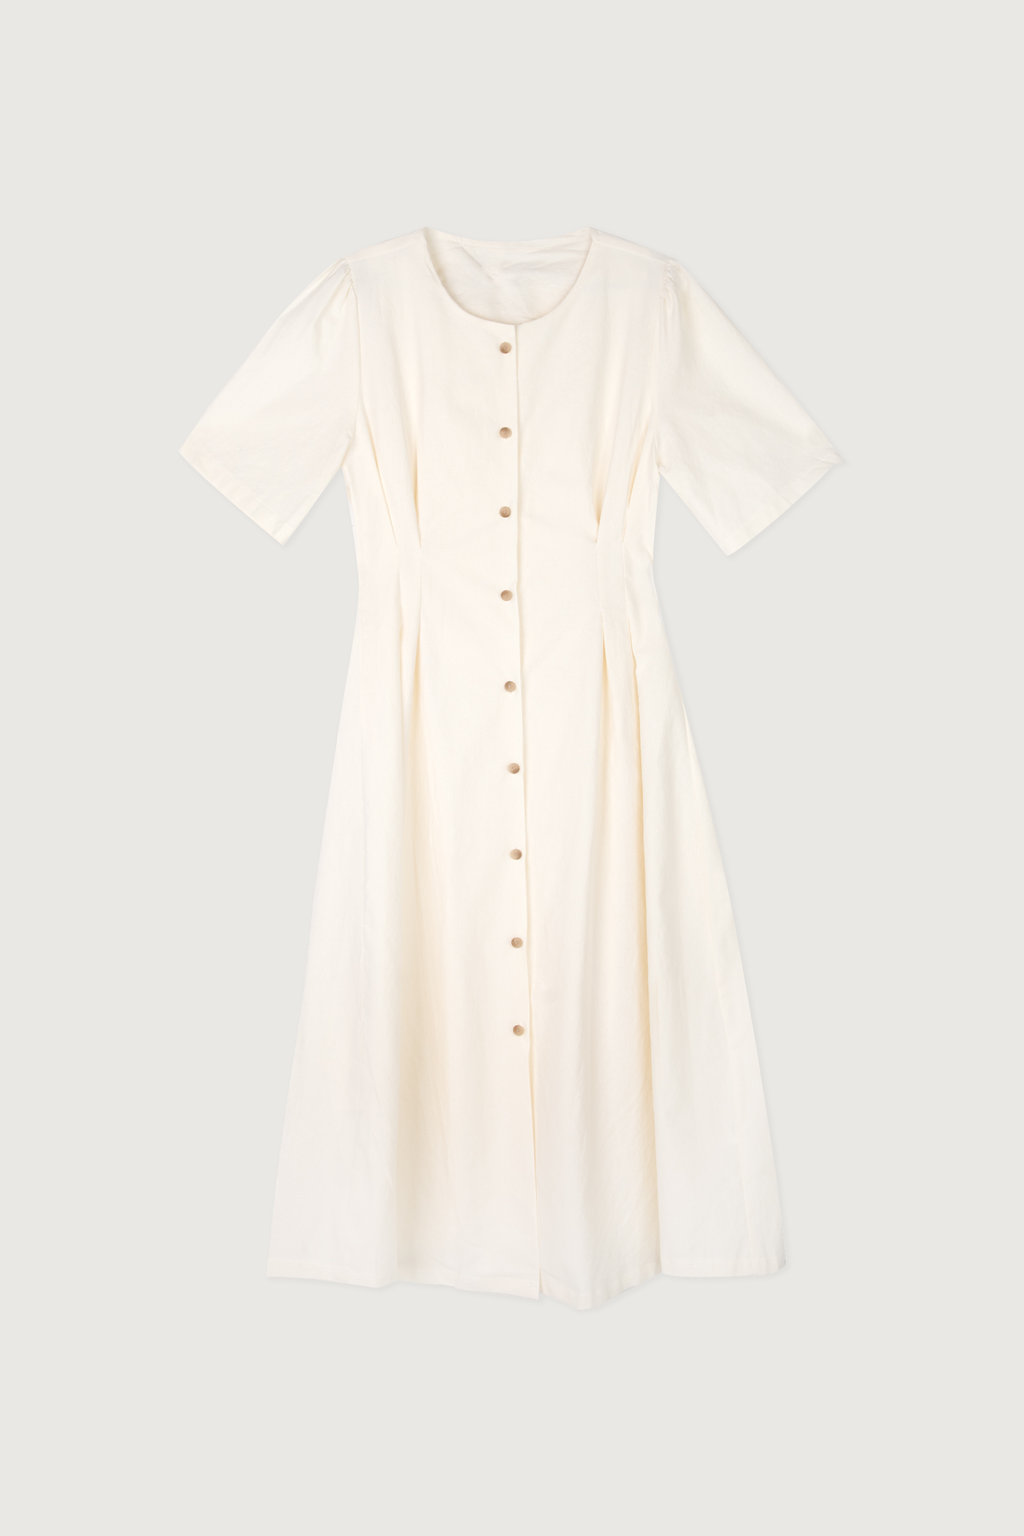 Dress K011 Cream 5